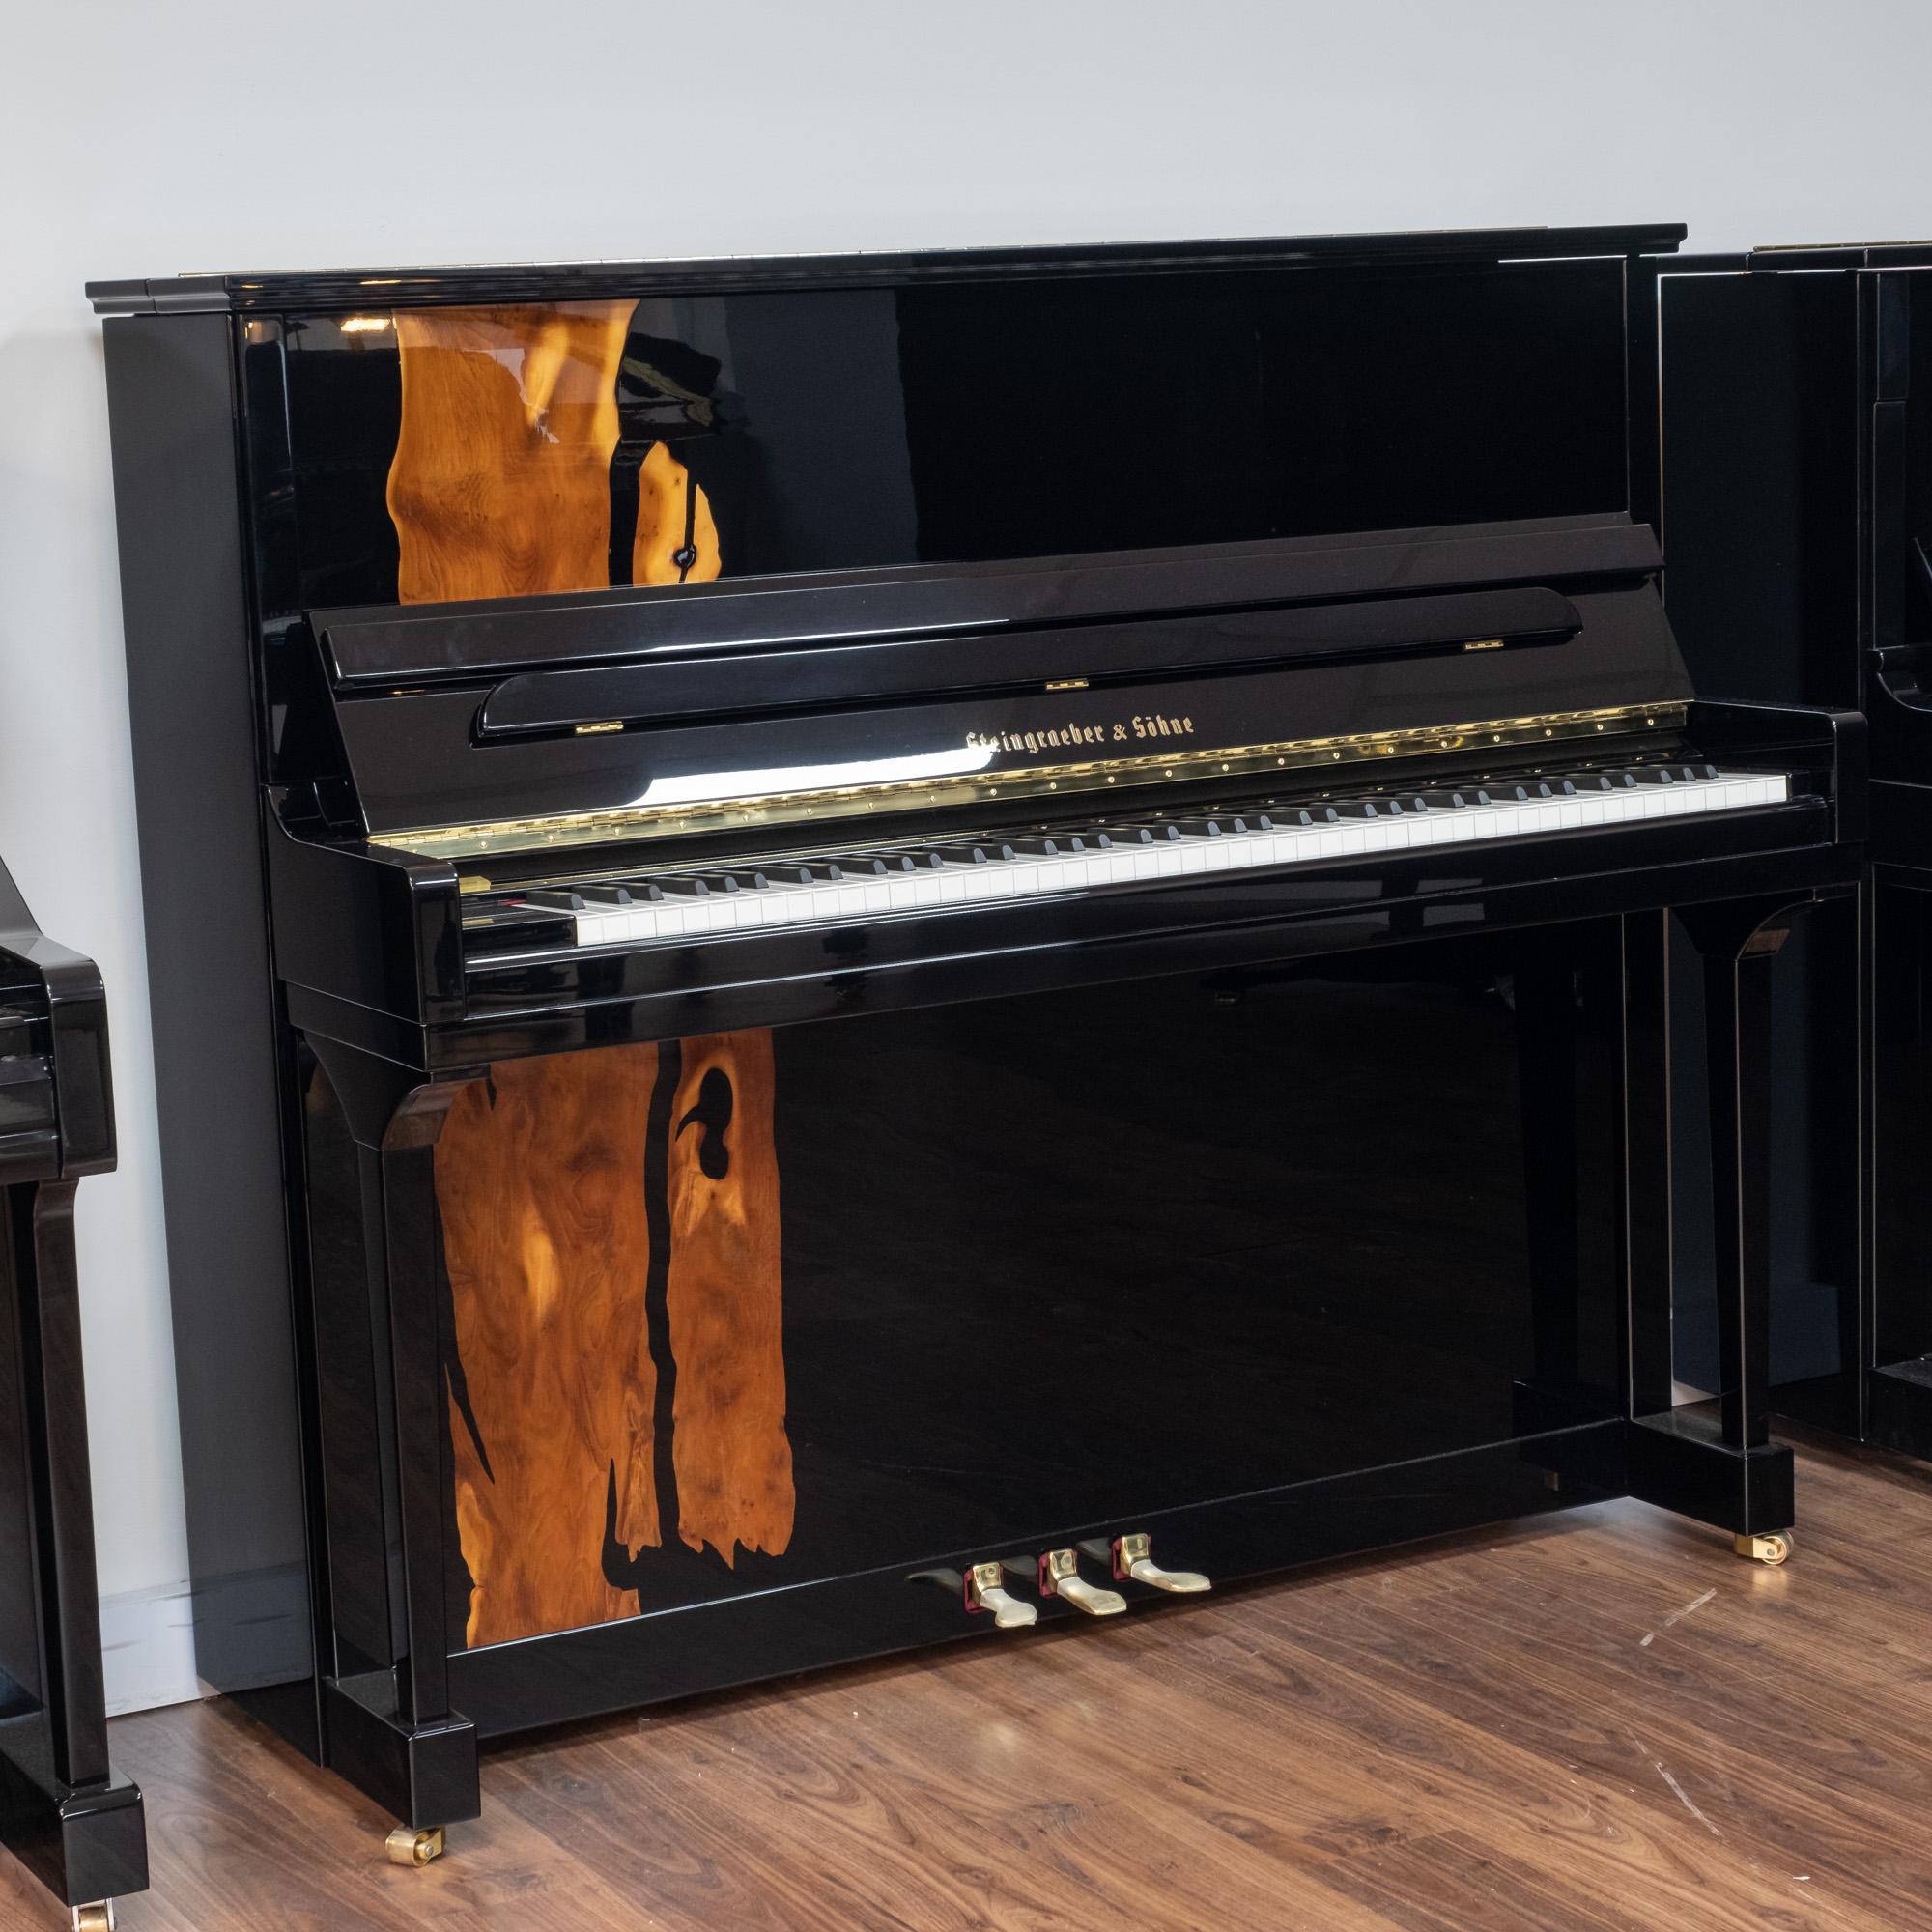 Steingraeber & Sohne 130 T-PS Upright Piano